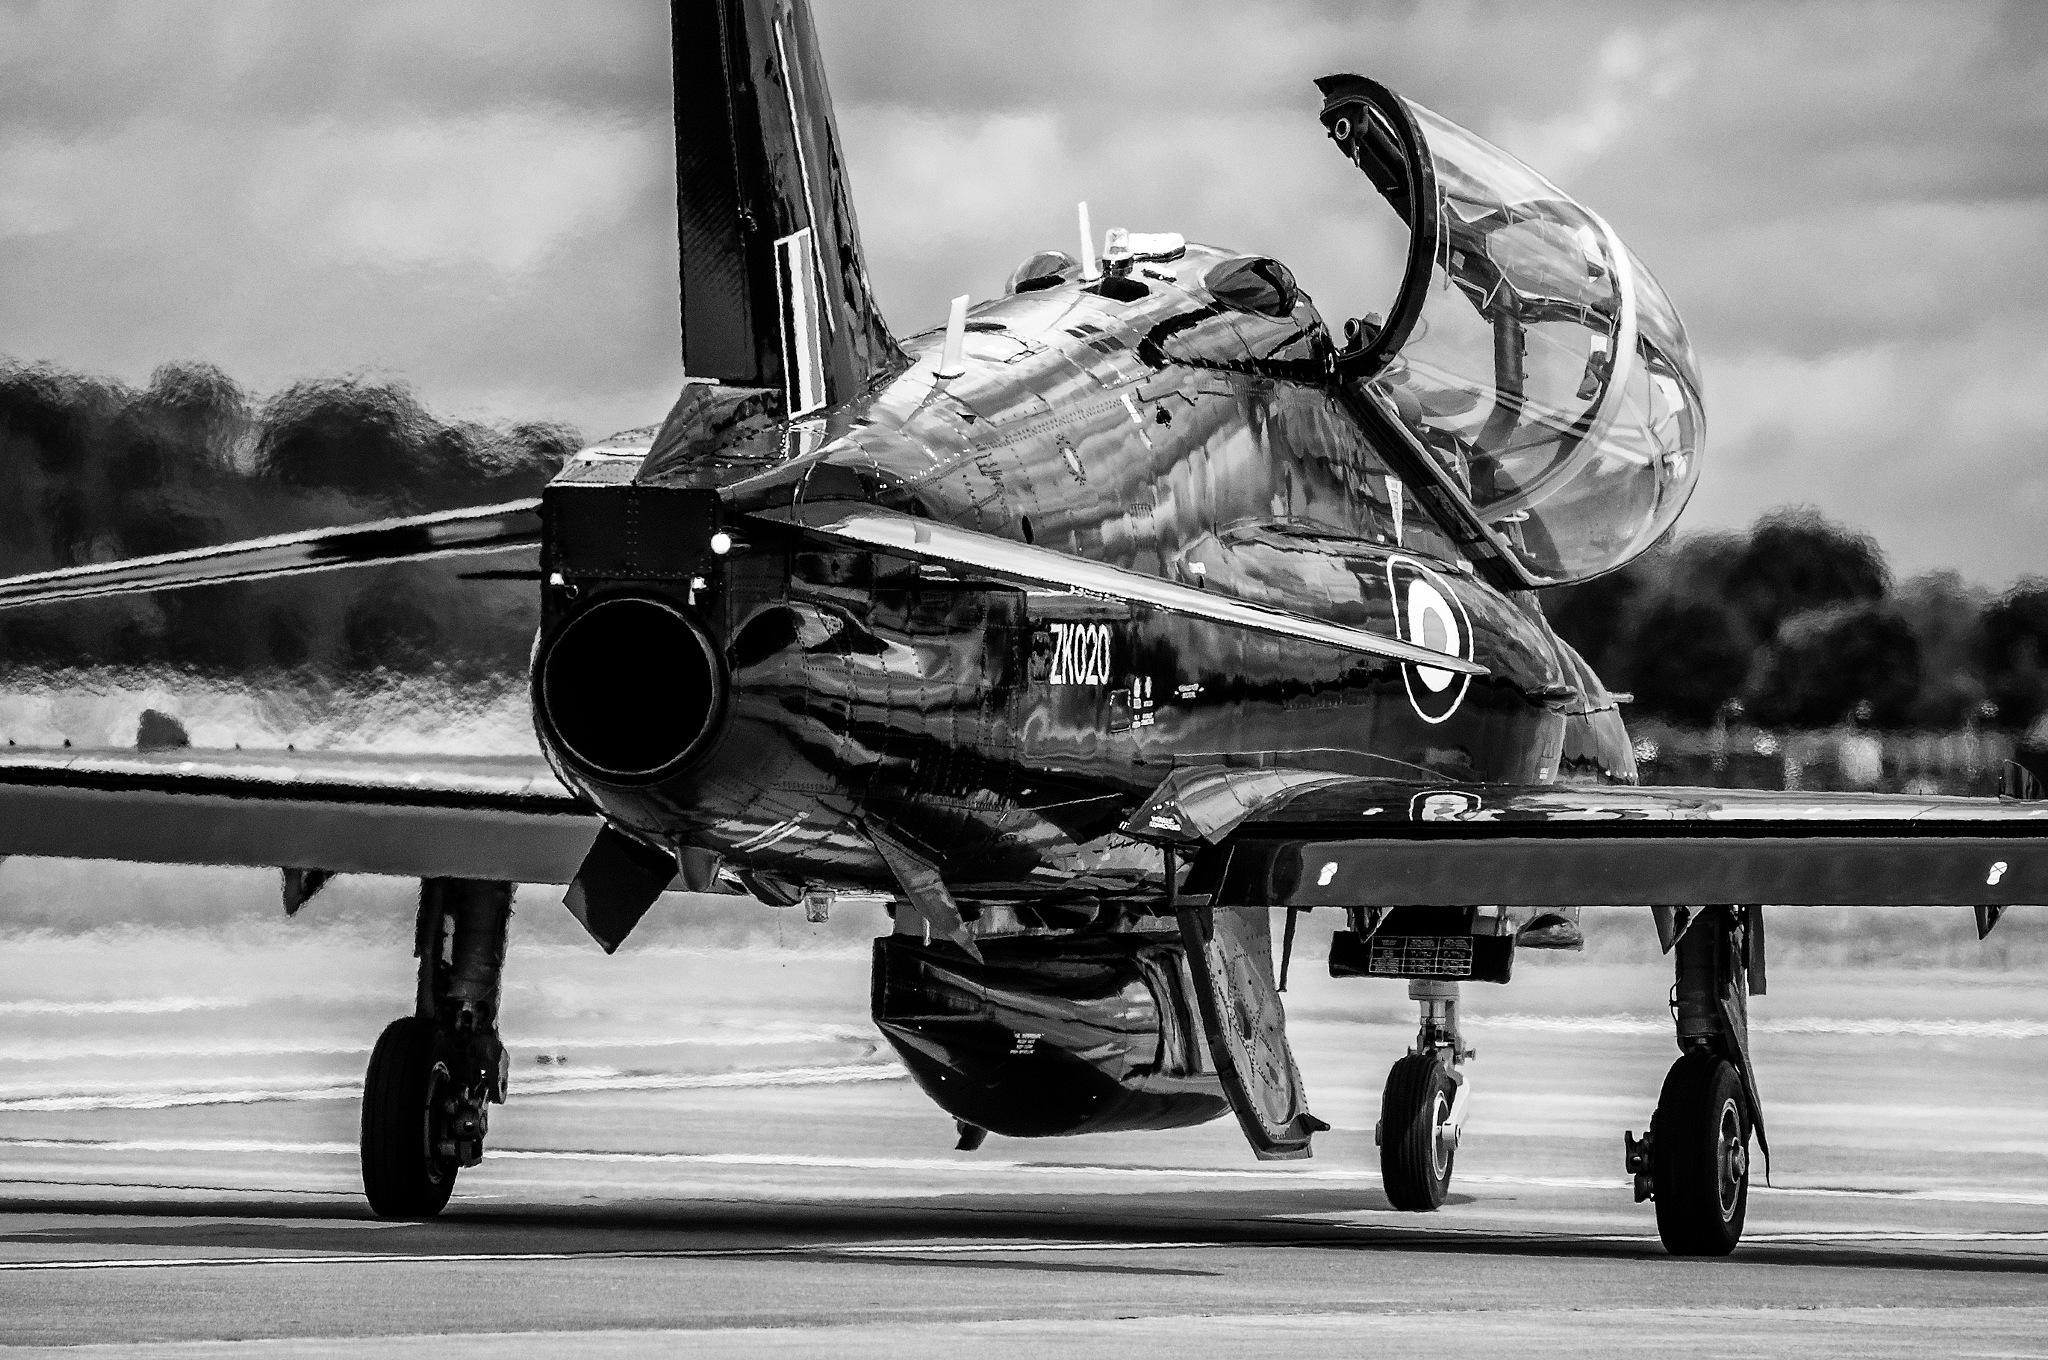 Hawk T2 by Dimred